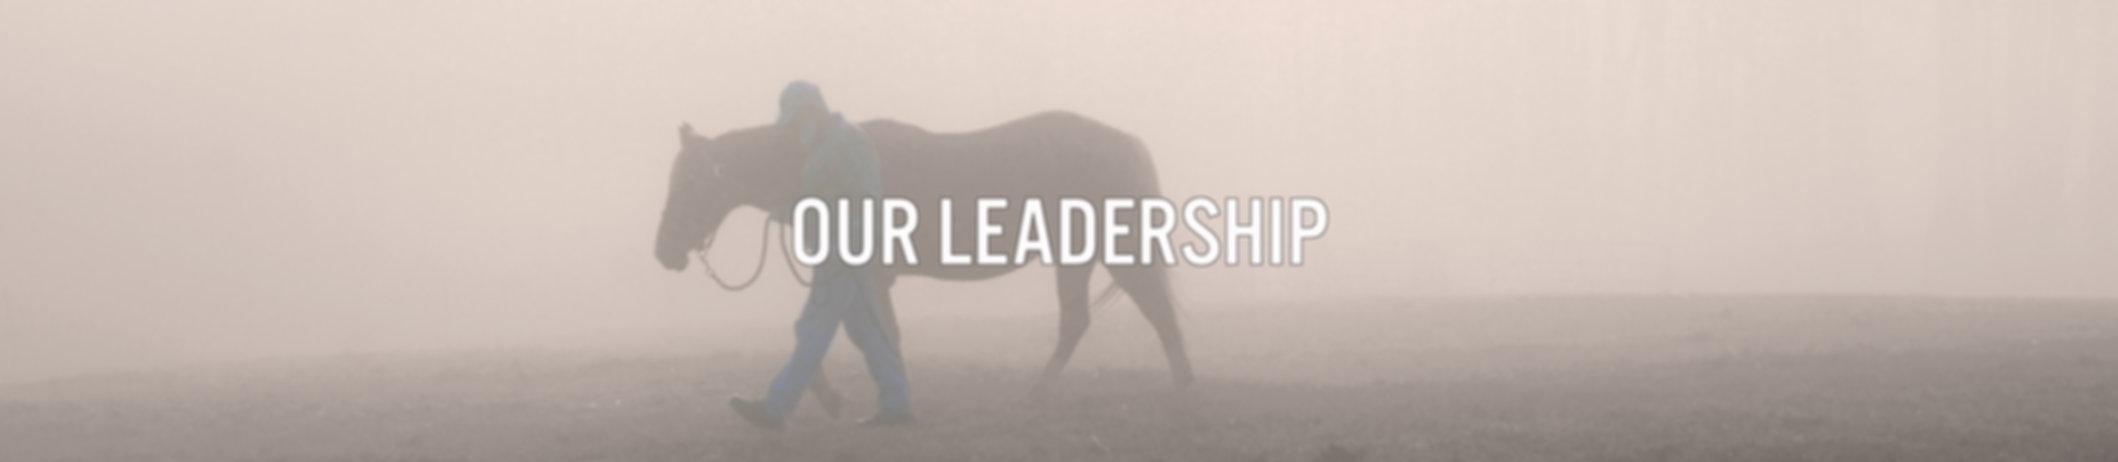 Our Leadership2TEXT.jpg